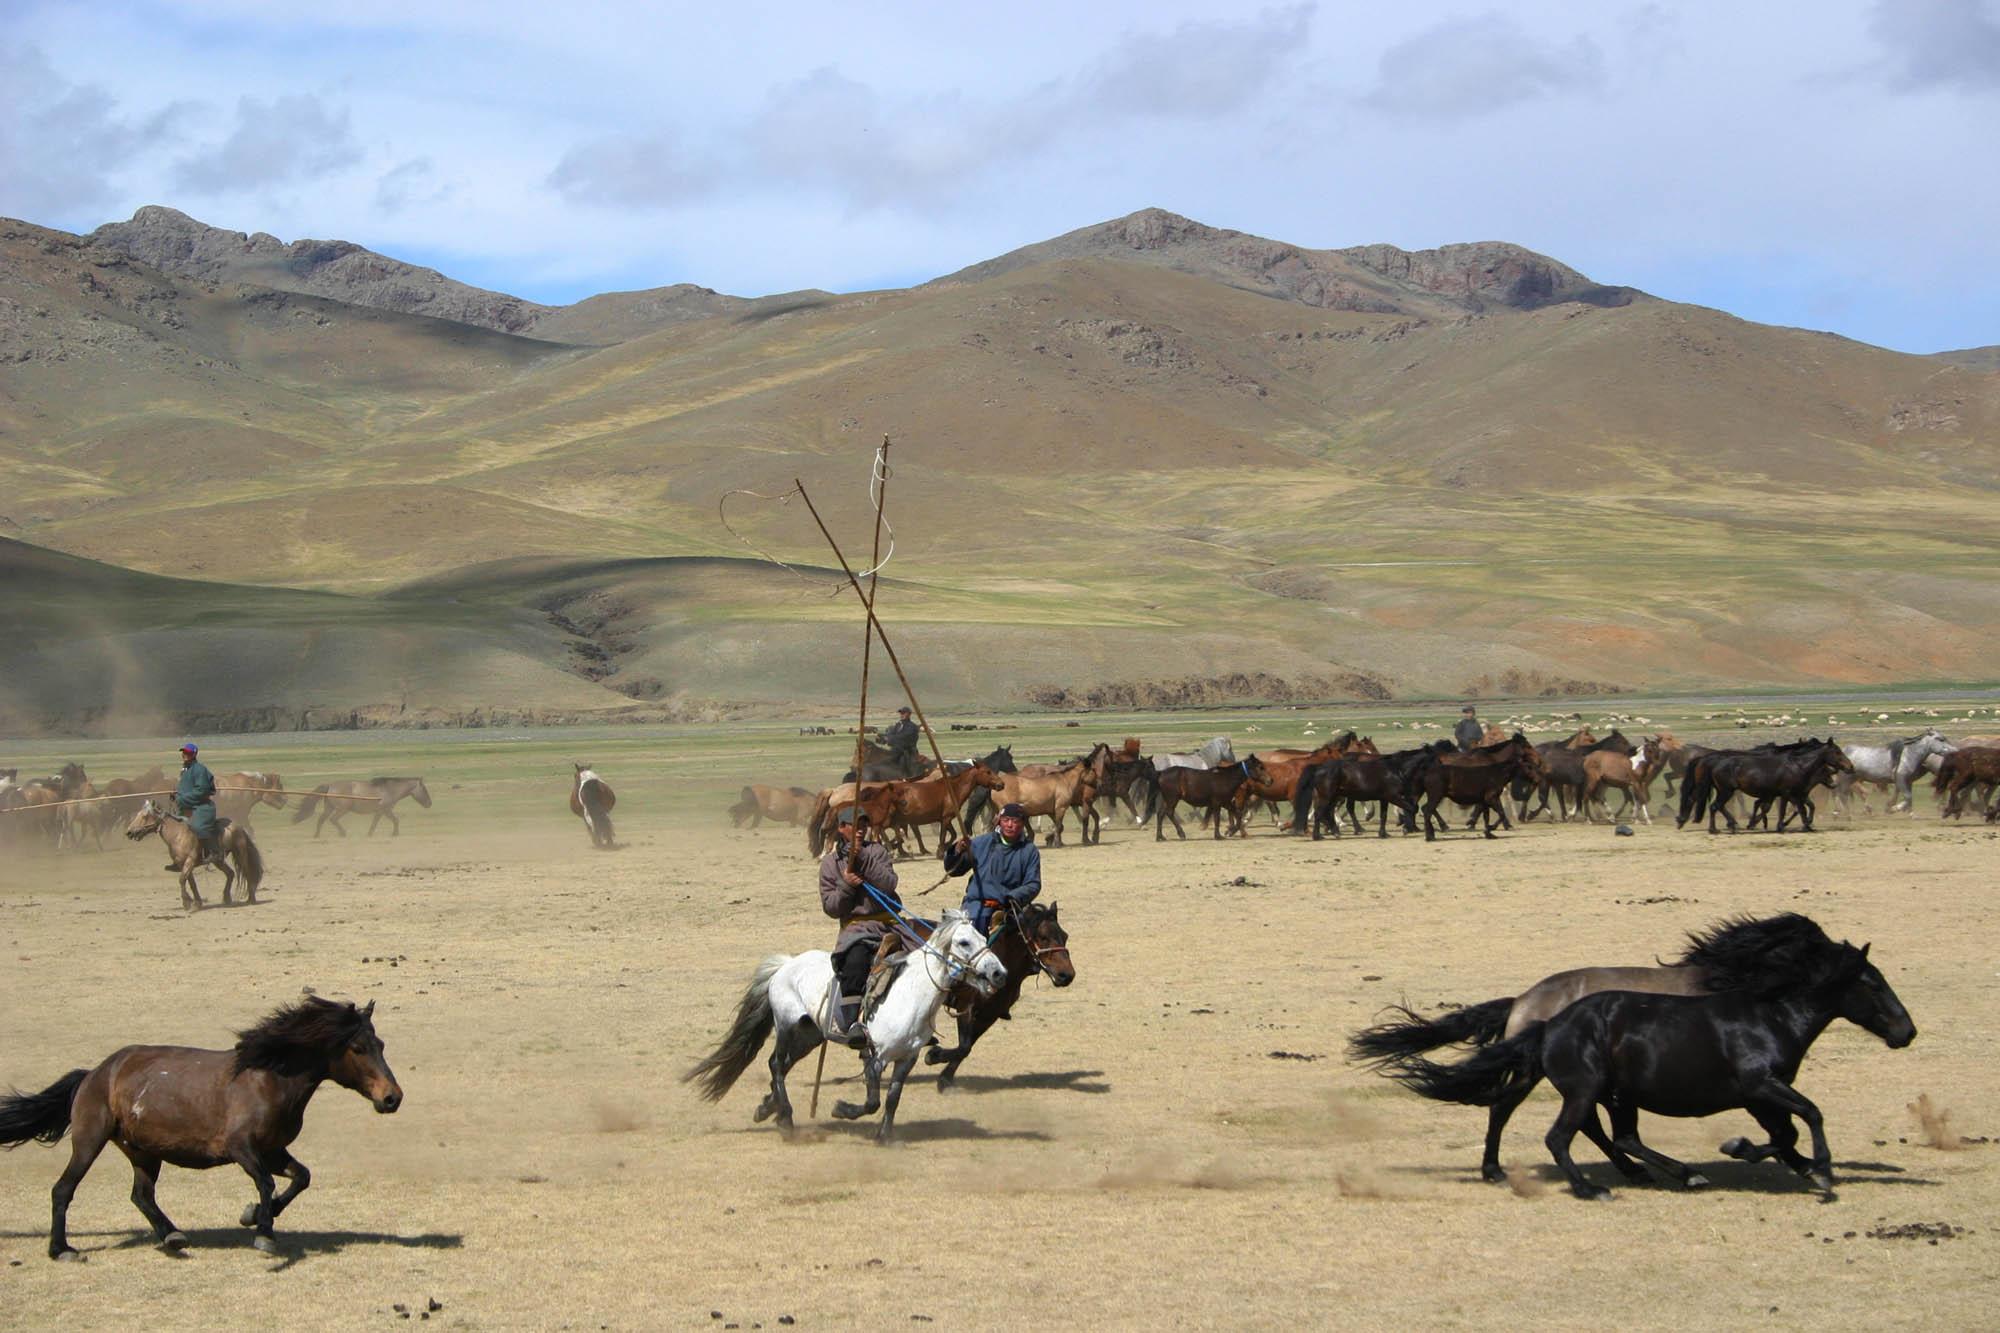 ©Randocheval - Mongolie